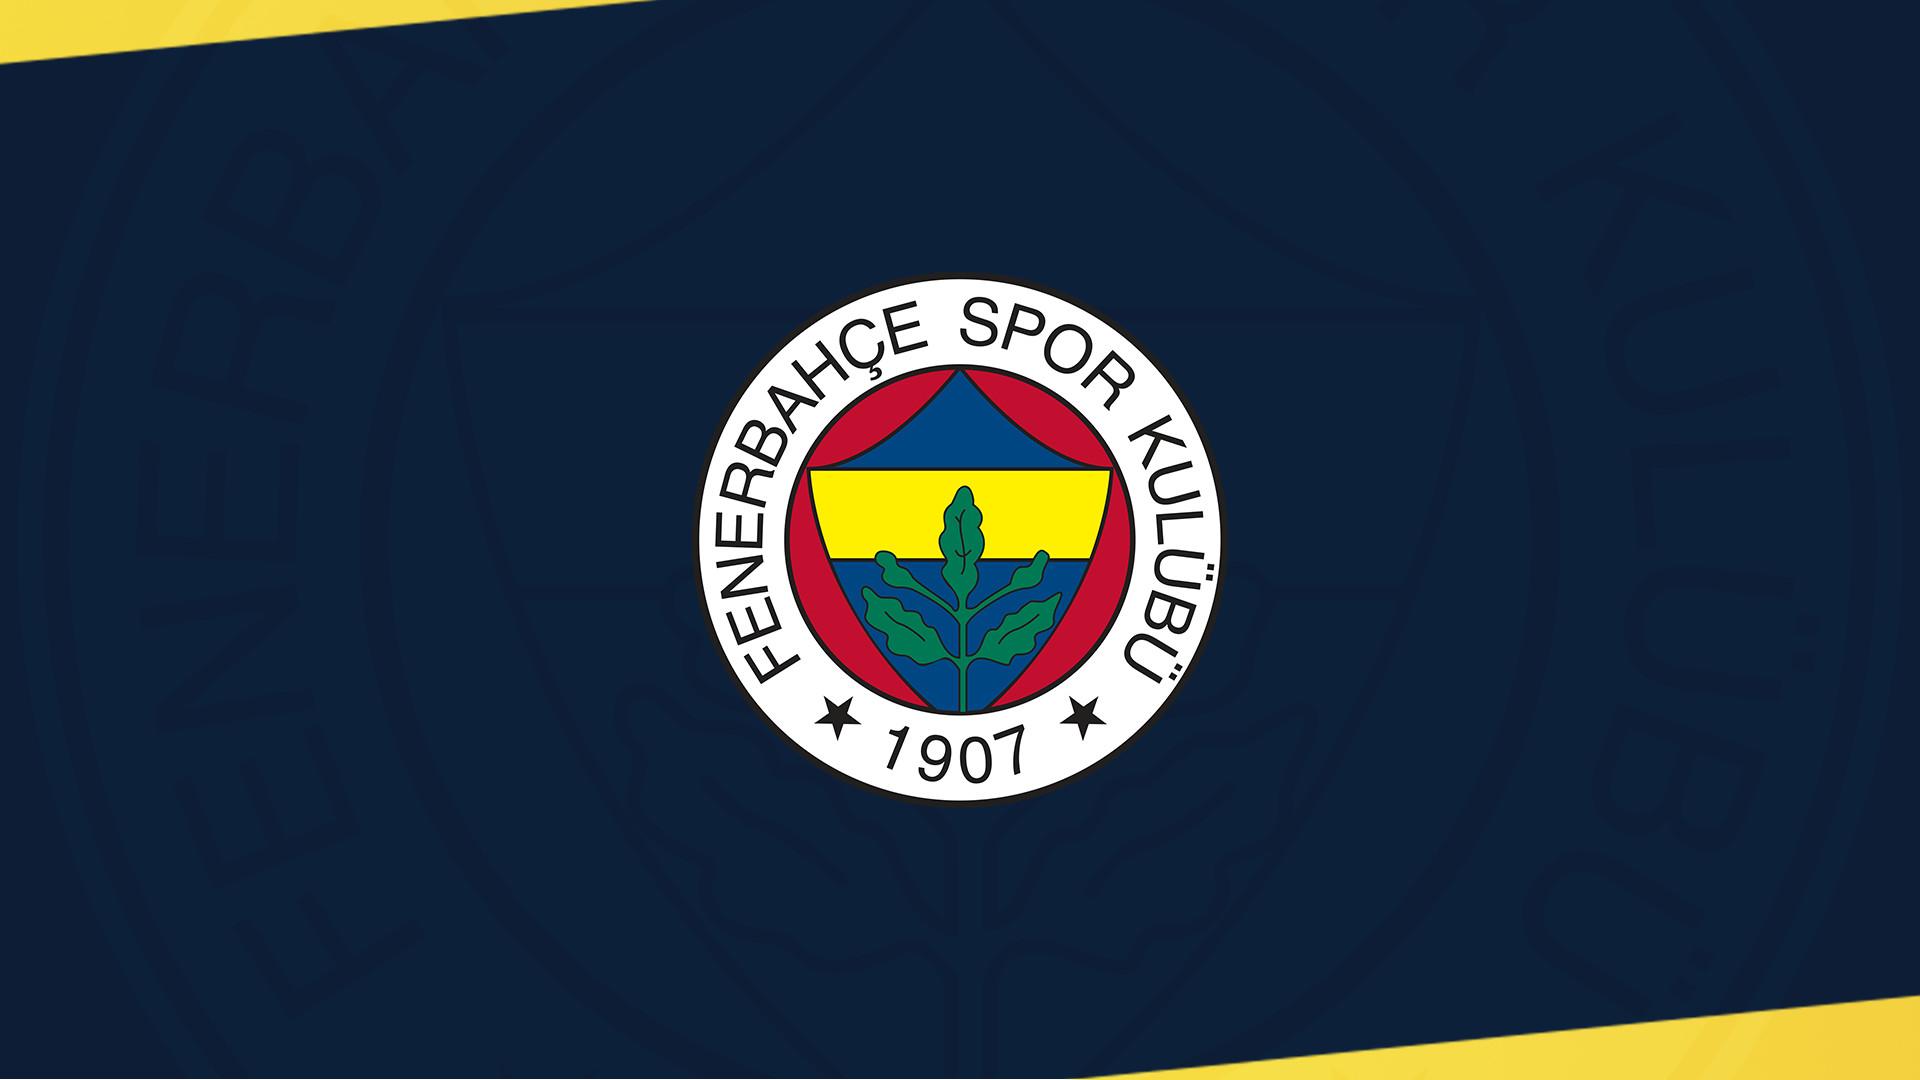 Fenerbahçe,Anayasa Mahkemesi'ne başvurdu.